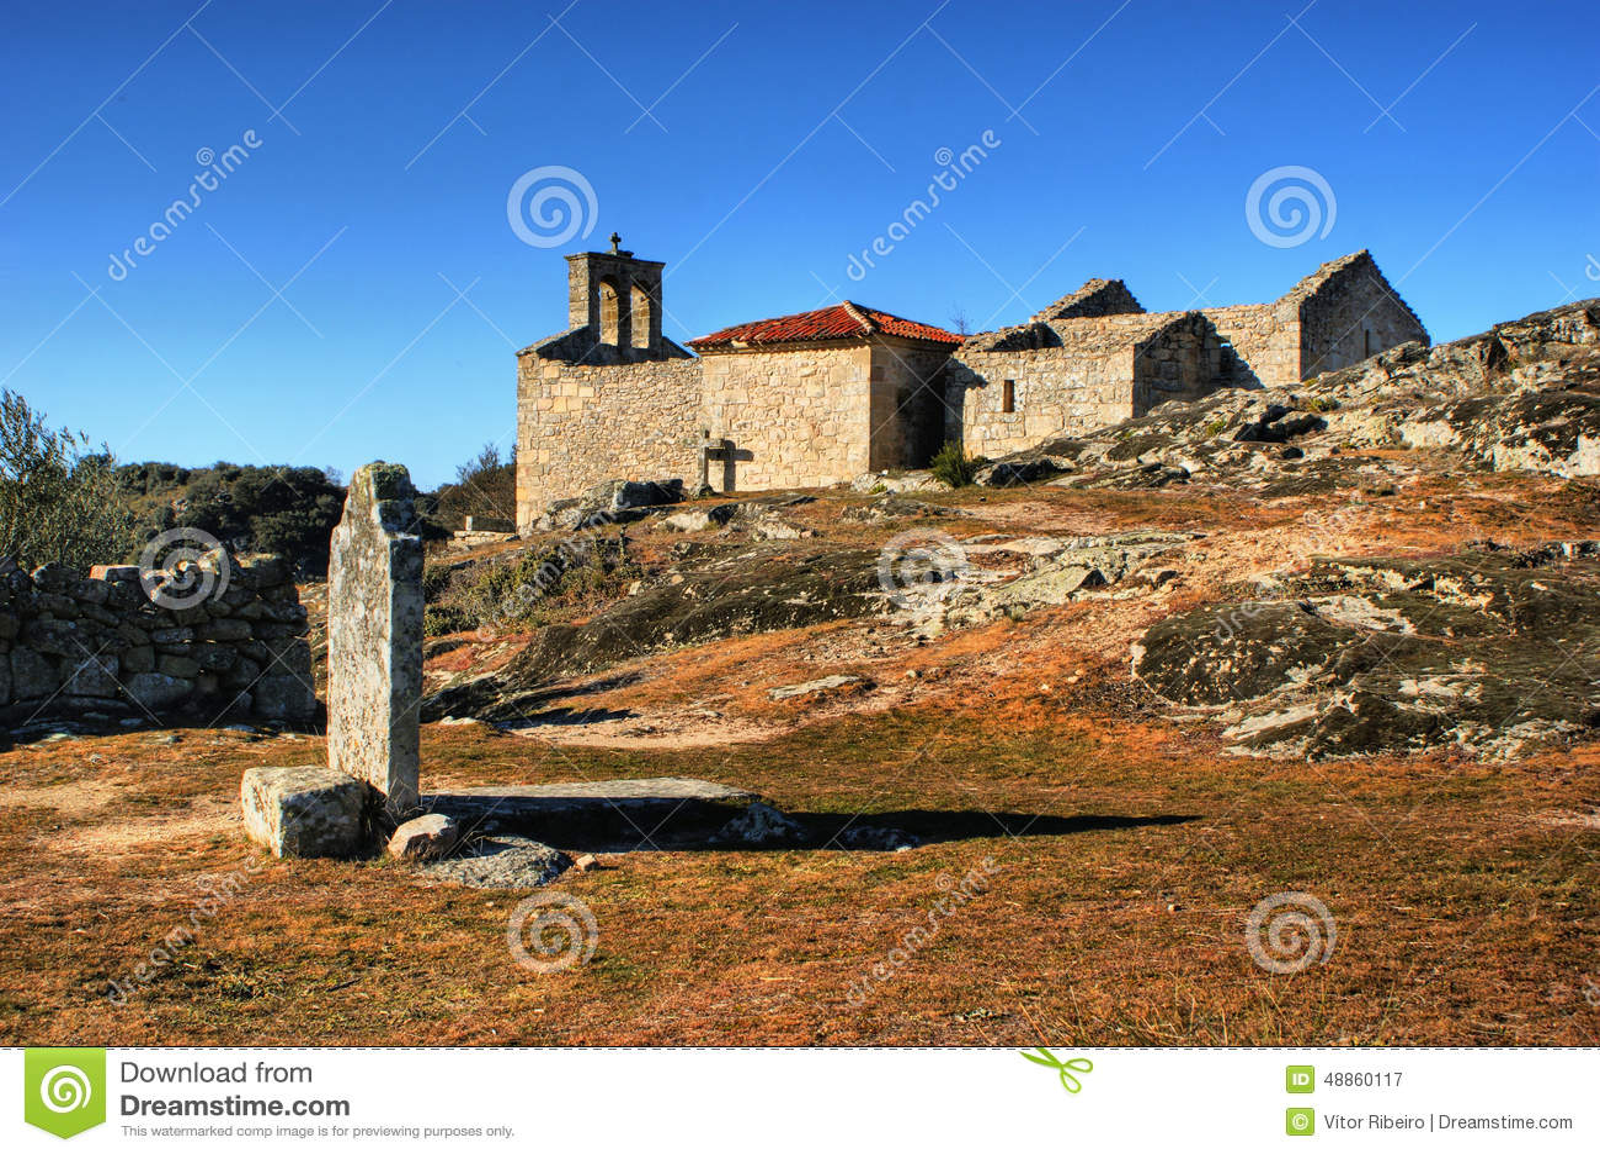 Grave in historical village of Castelo Mendo